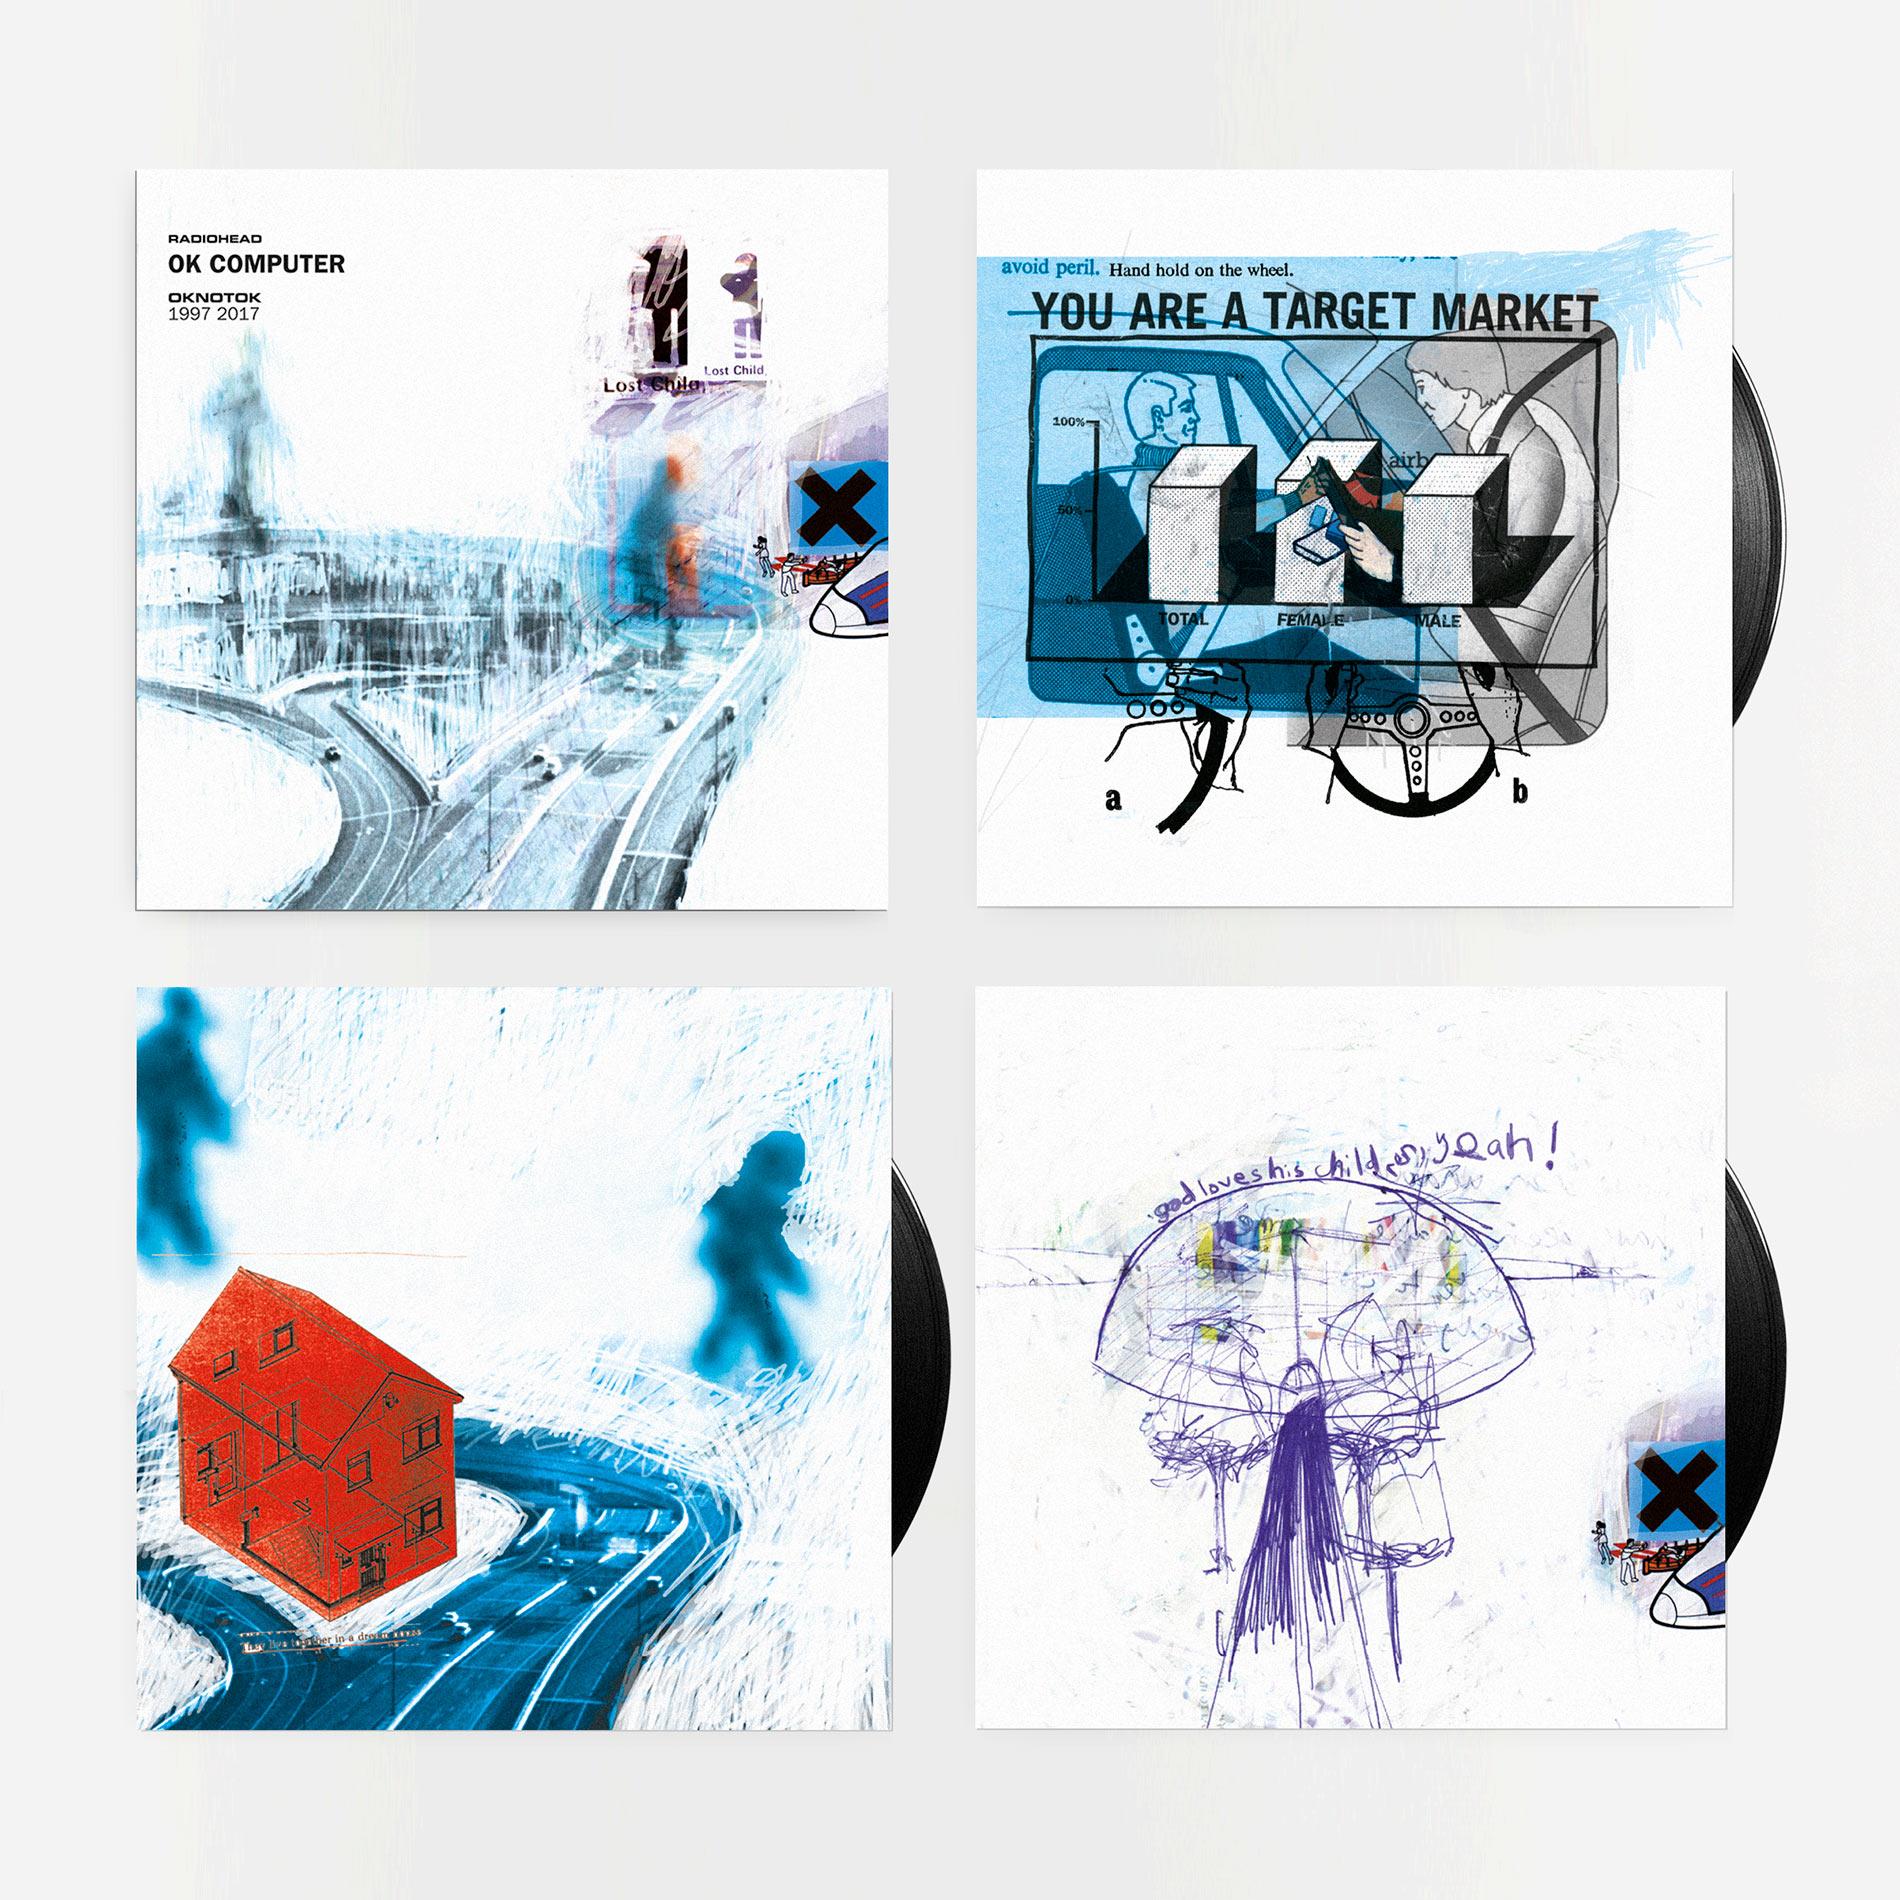 Radiohead Hides 8 Bit Secret Message In The Remastered